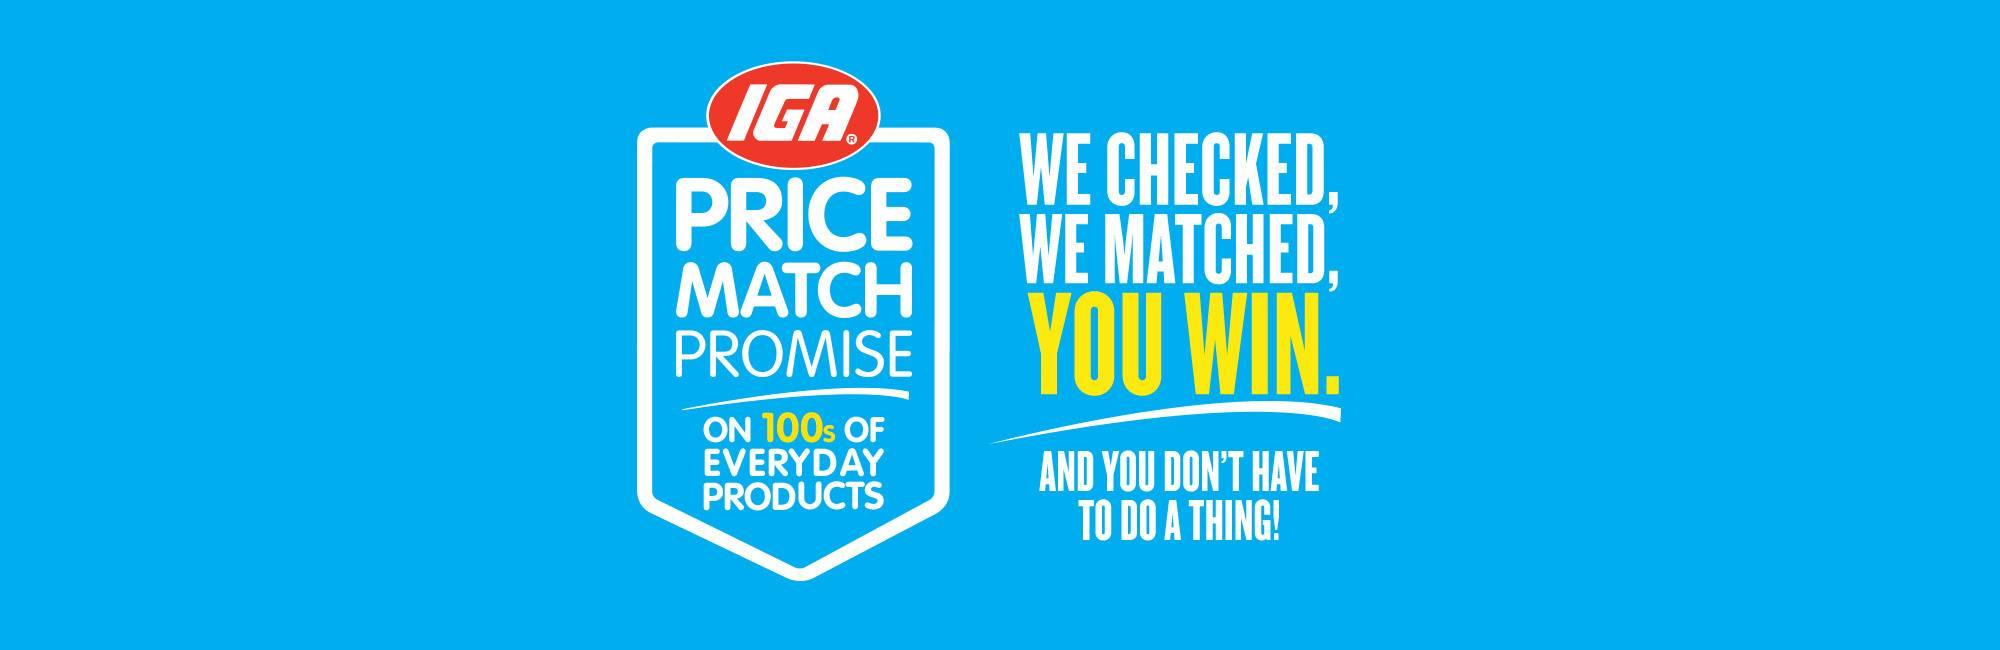 IGA Price Match Promise Header3